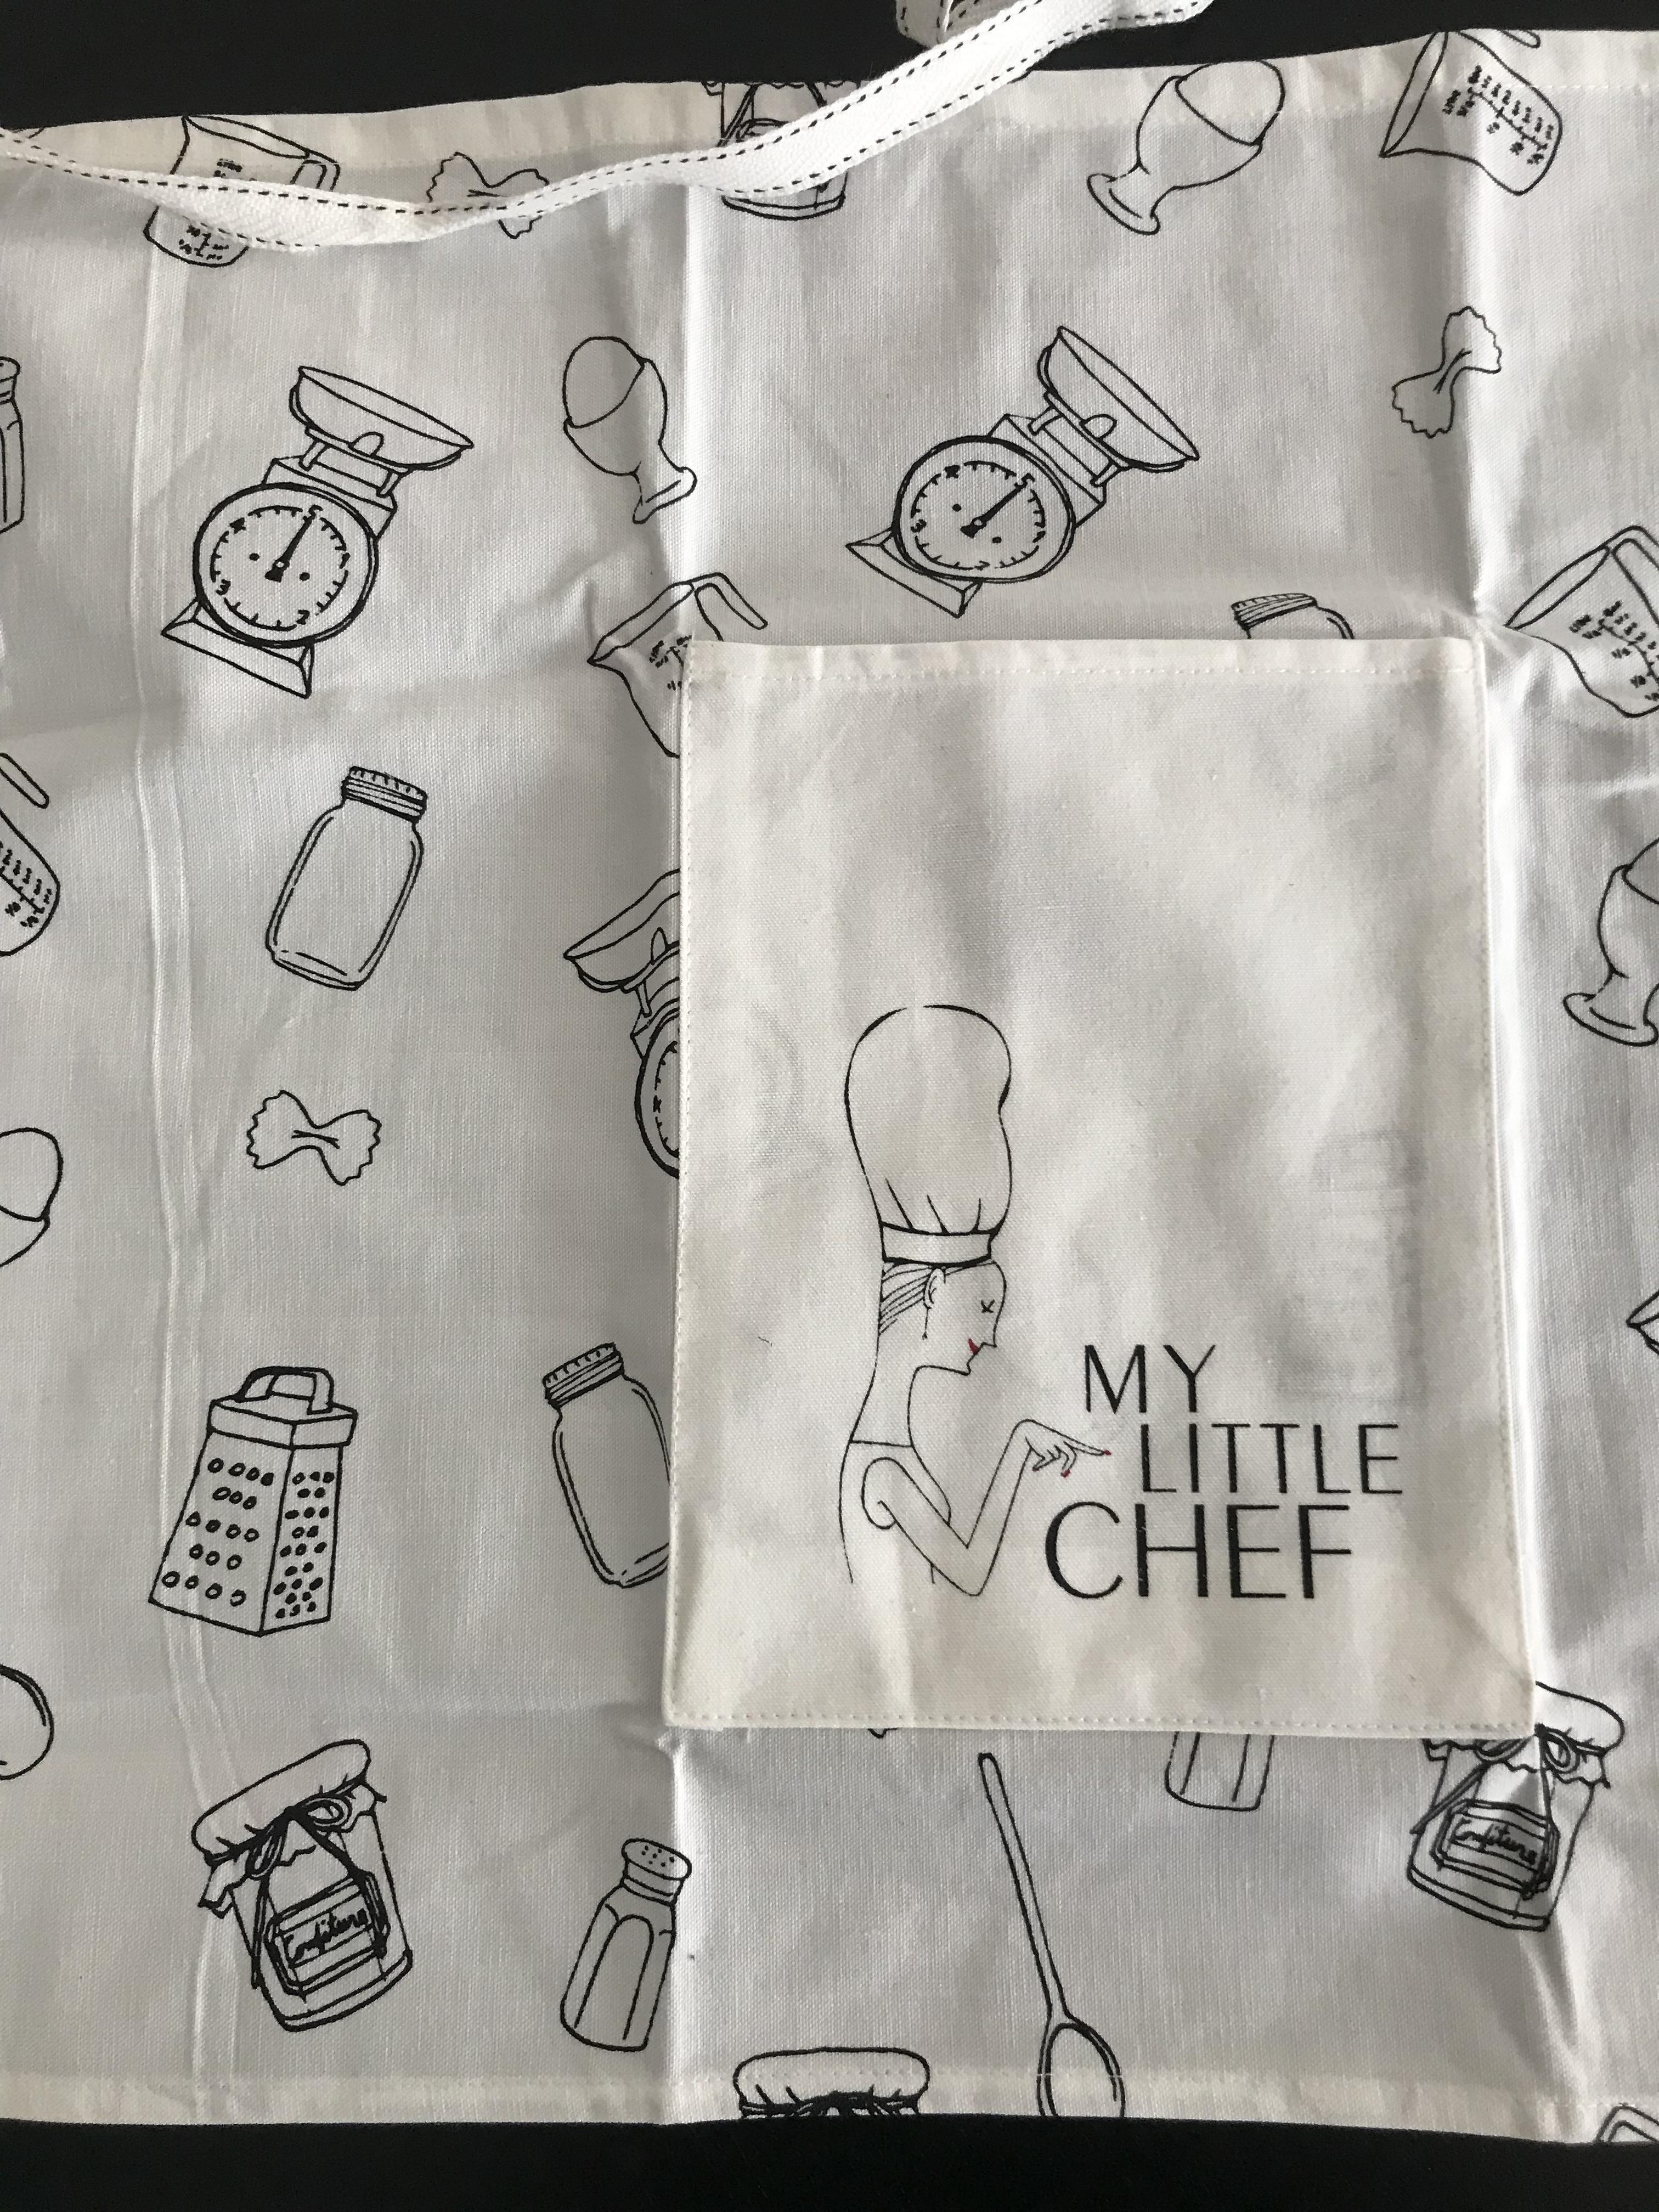 troc de troc tablier cuisine image 1